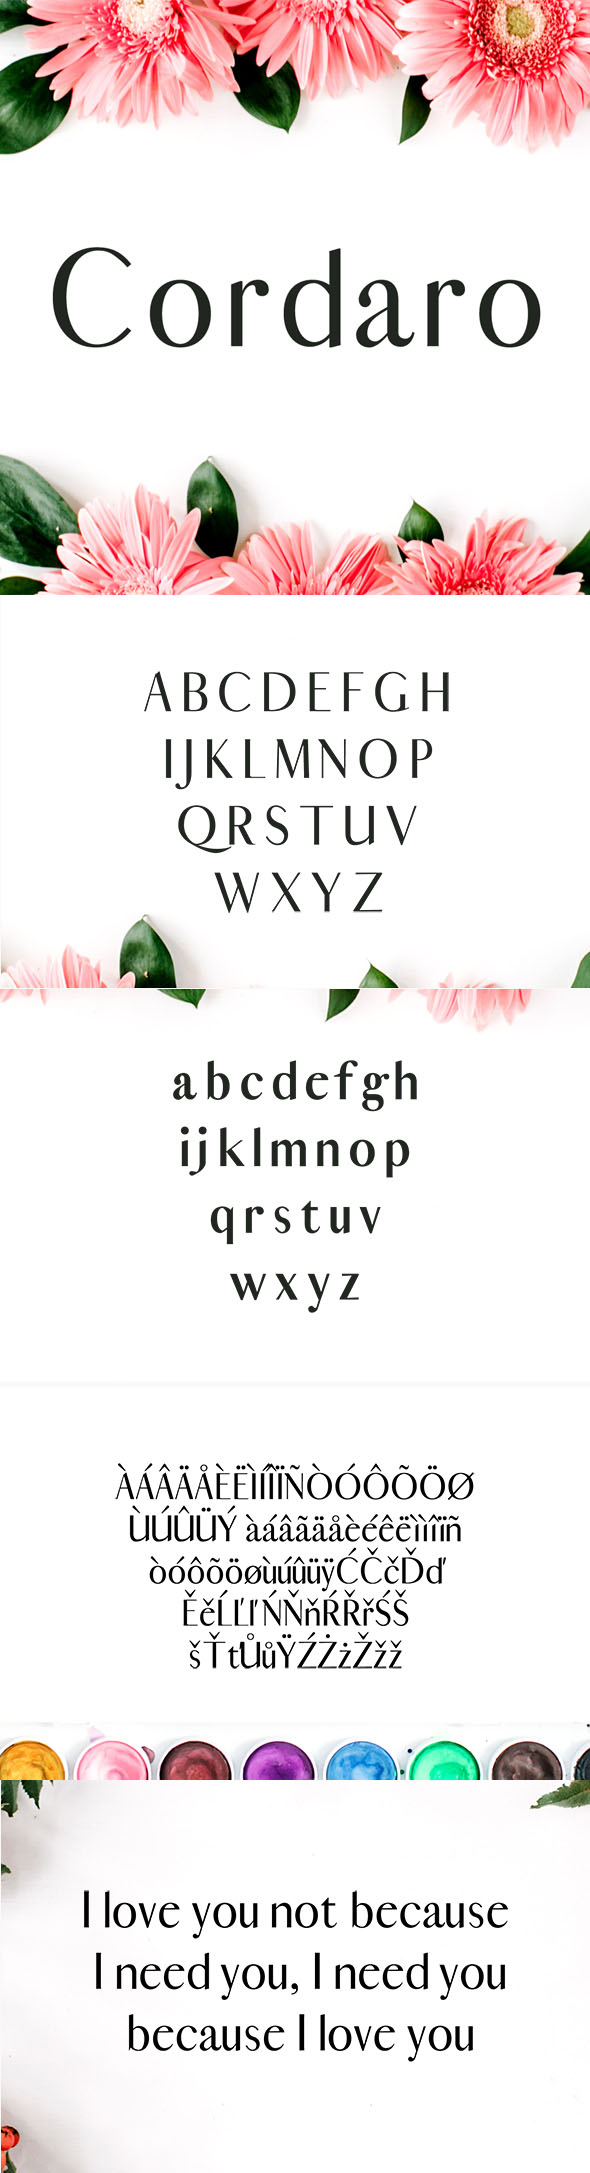 Cordaro Serif Typeface - Serif Fonts